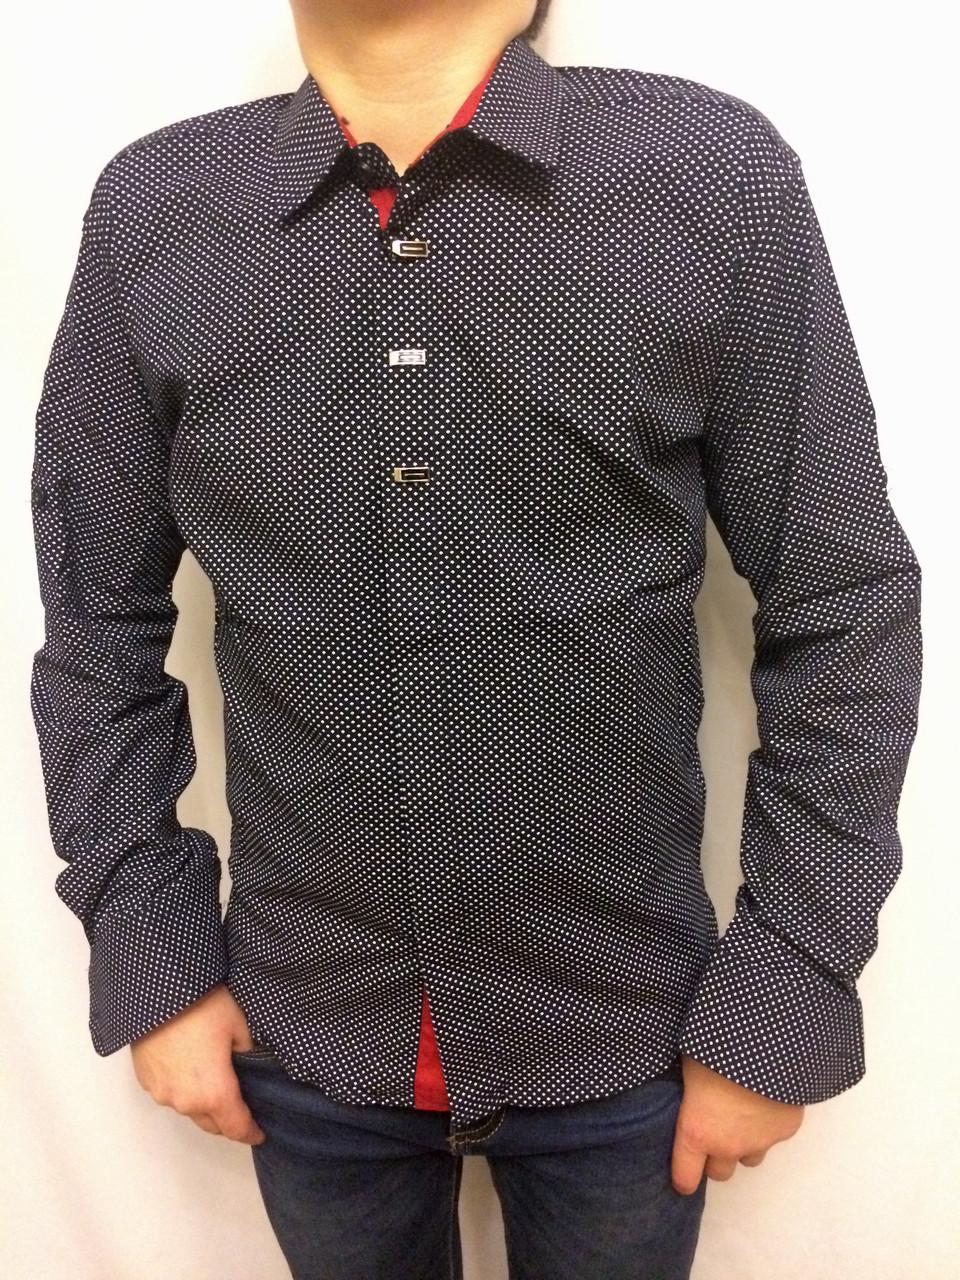 Рубашка для подростка без окантовки планки